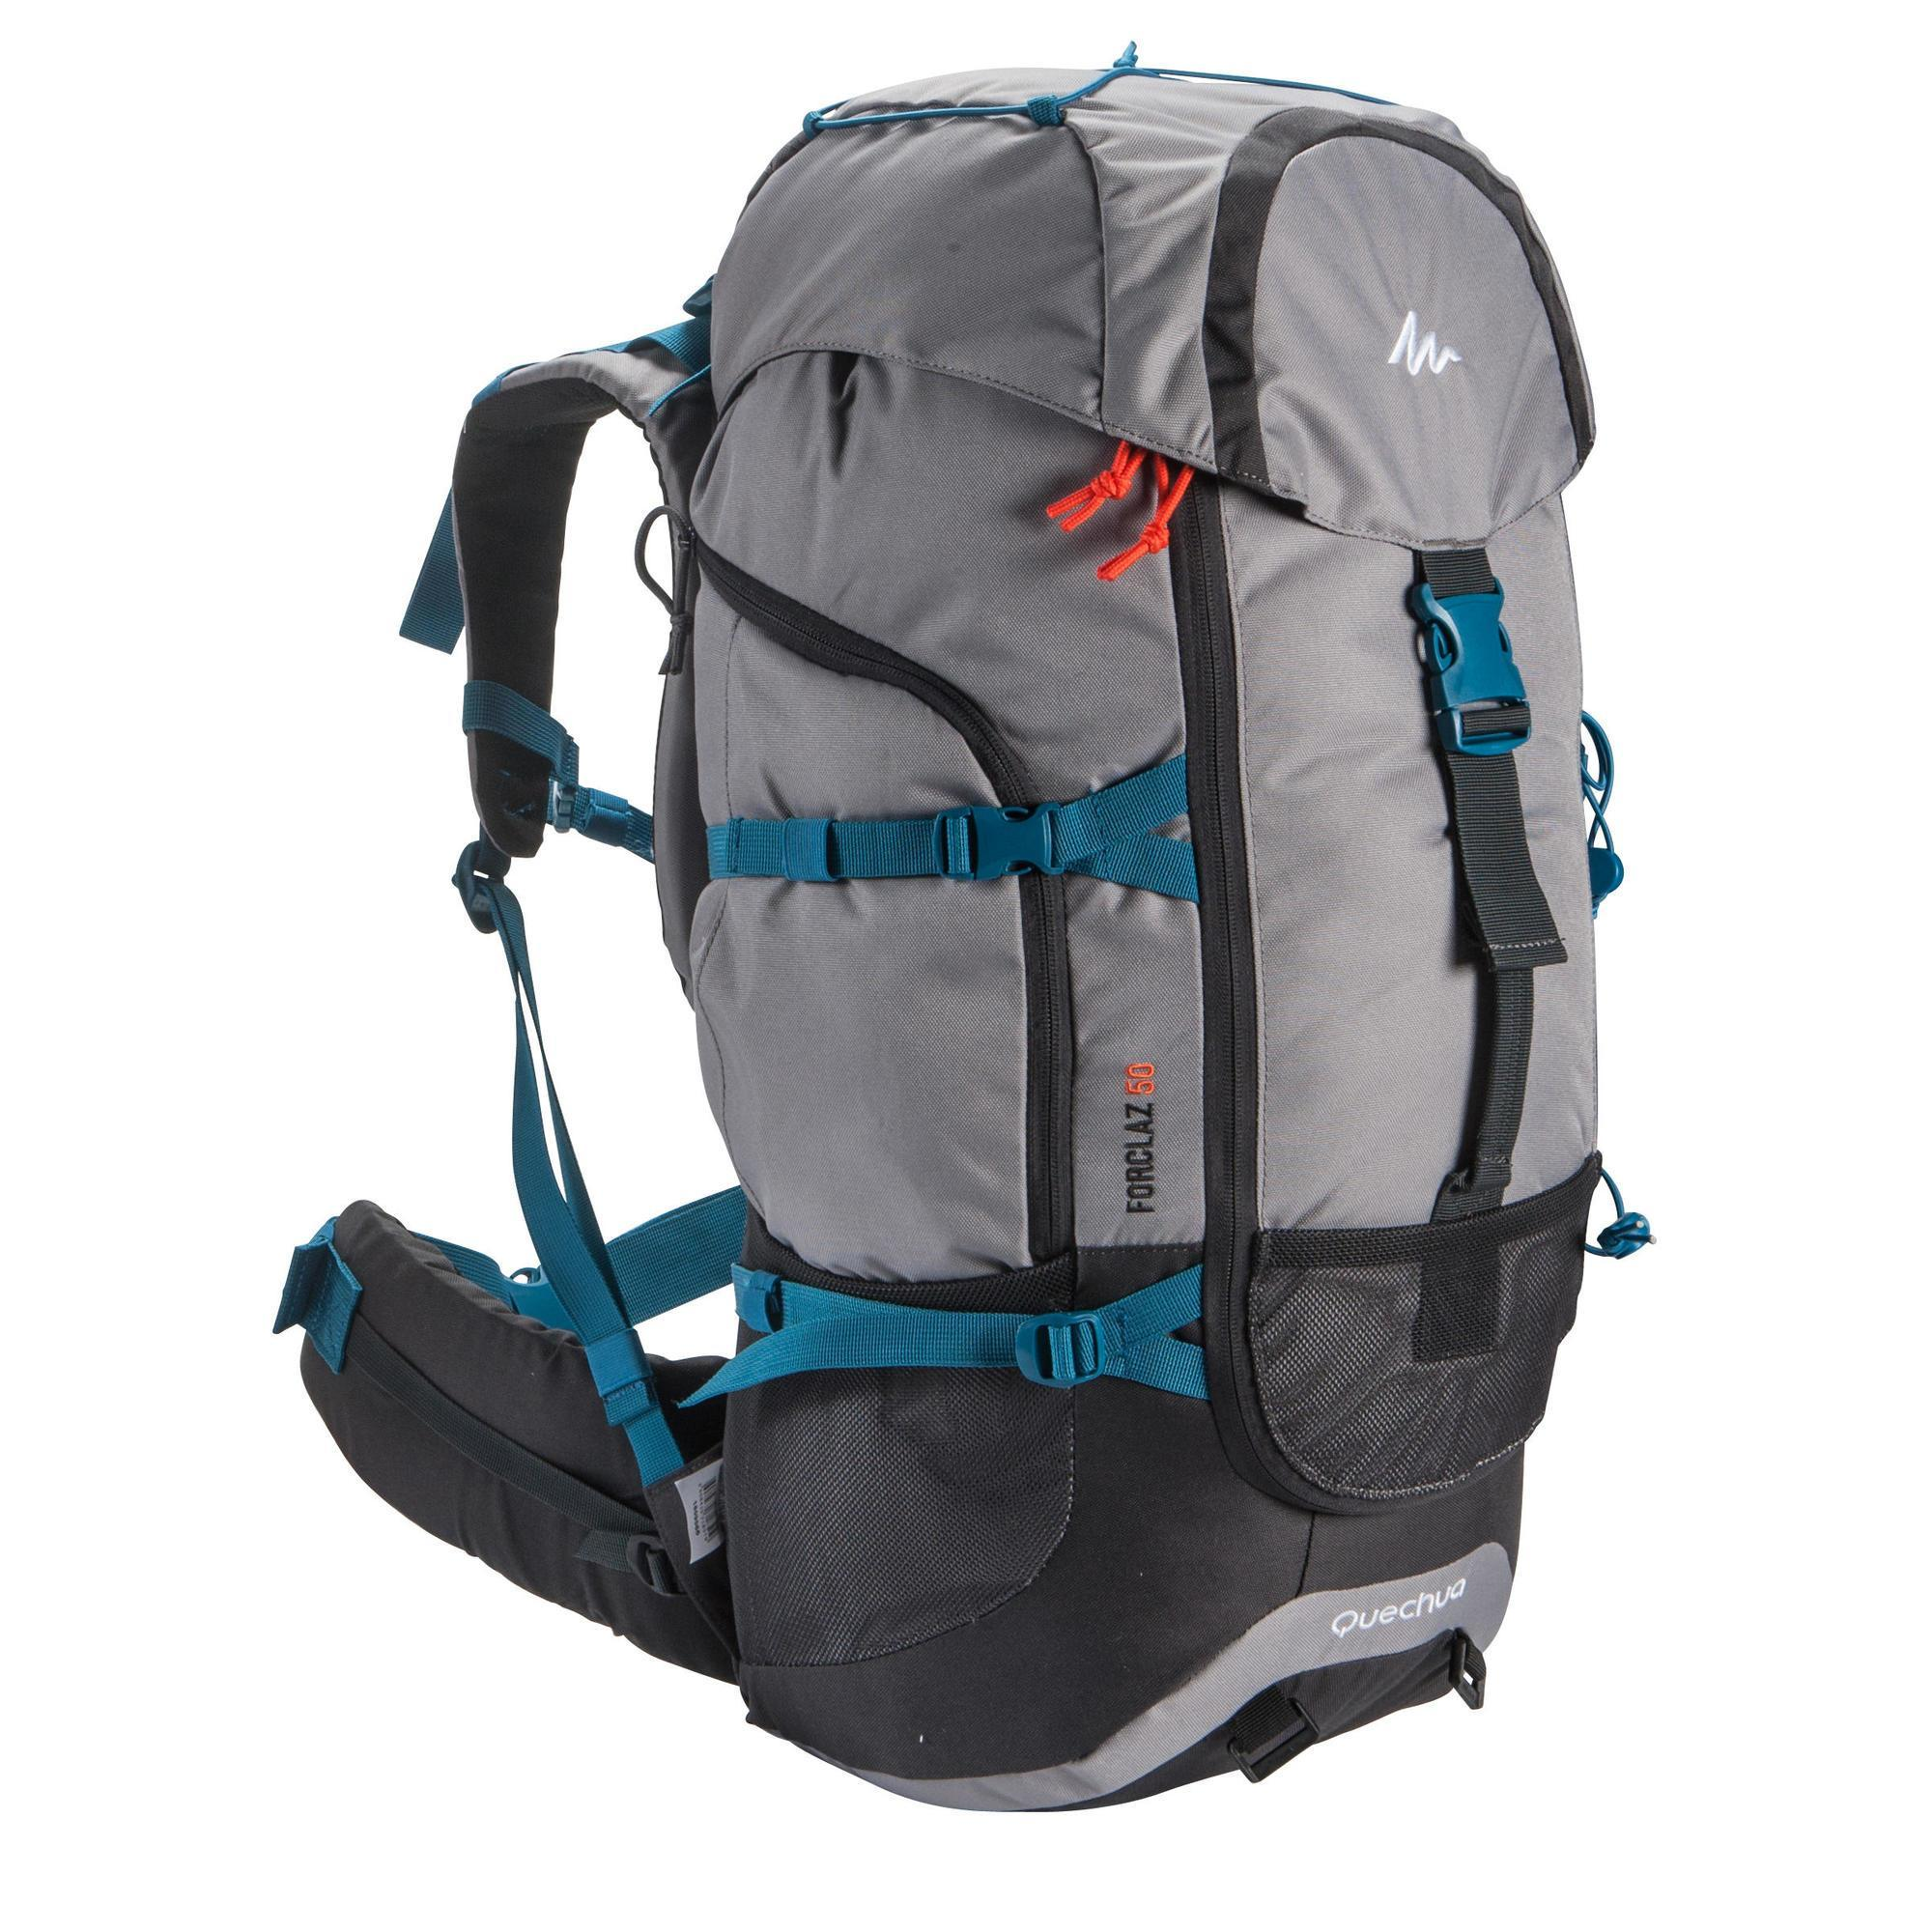 Backpacking-Rucksack Forclaz 50 Liter grau